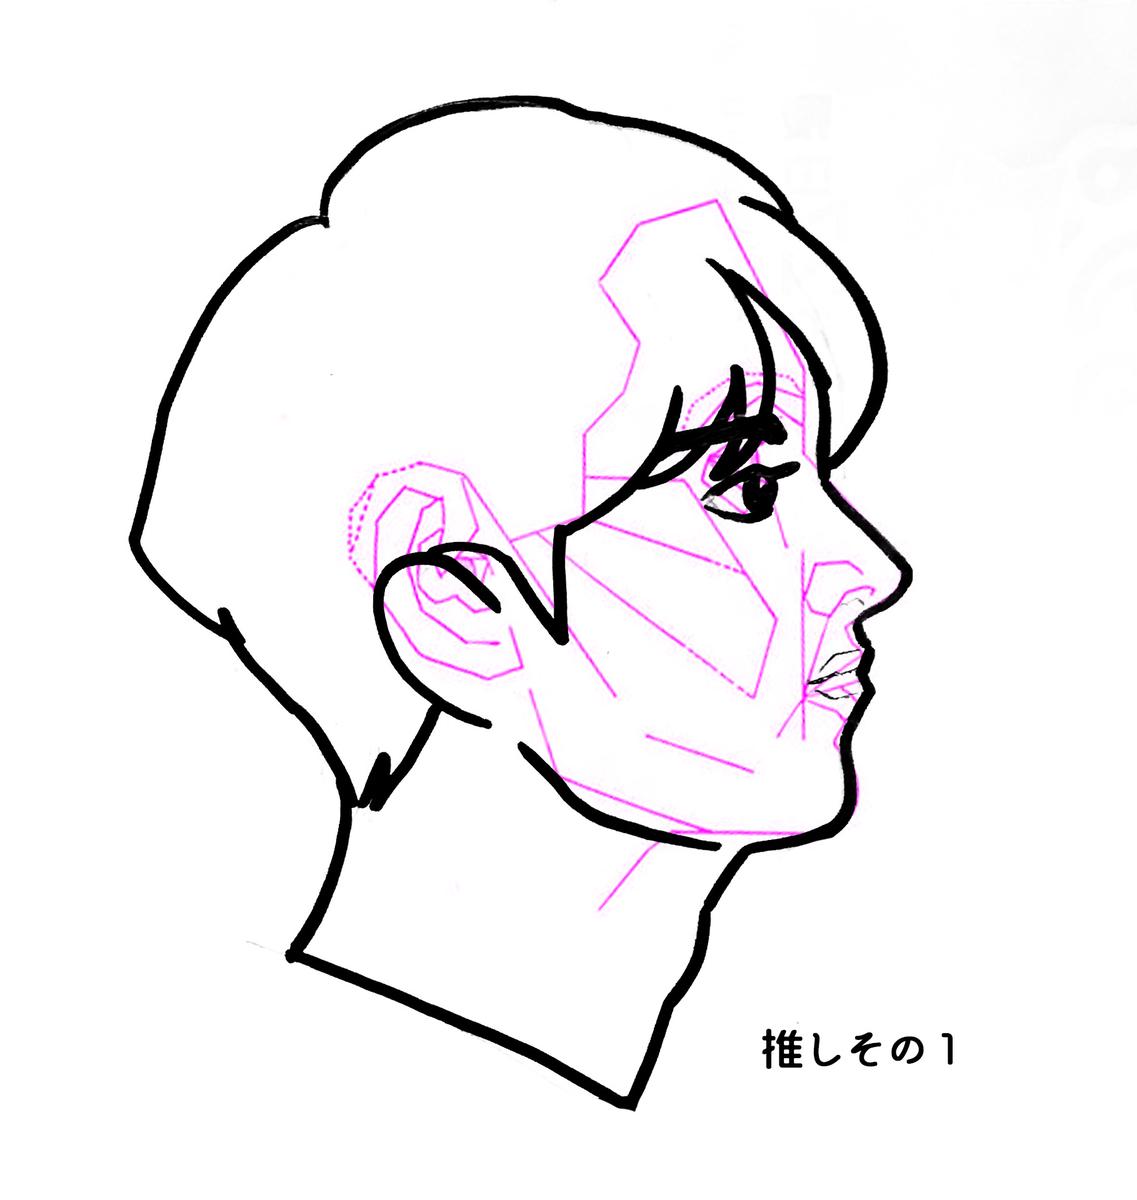 f:id:hayakawasetsuyaku:20200619193909j:plain